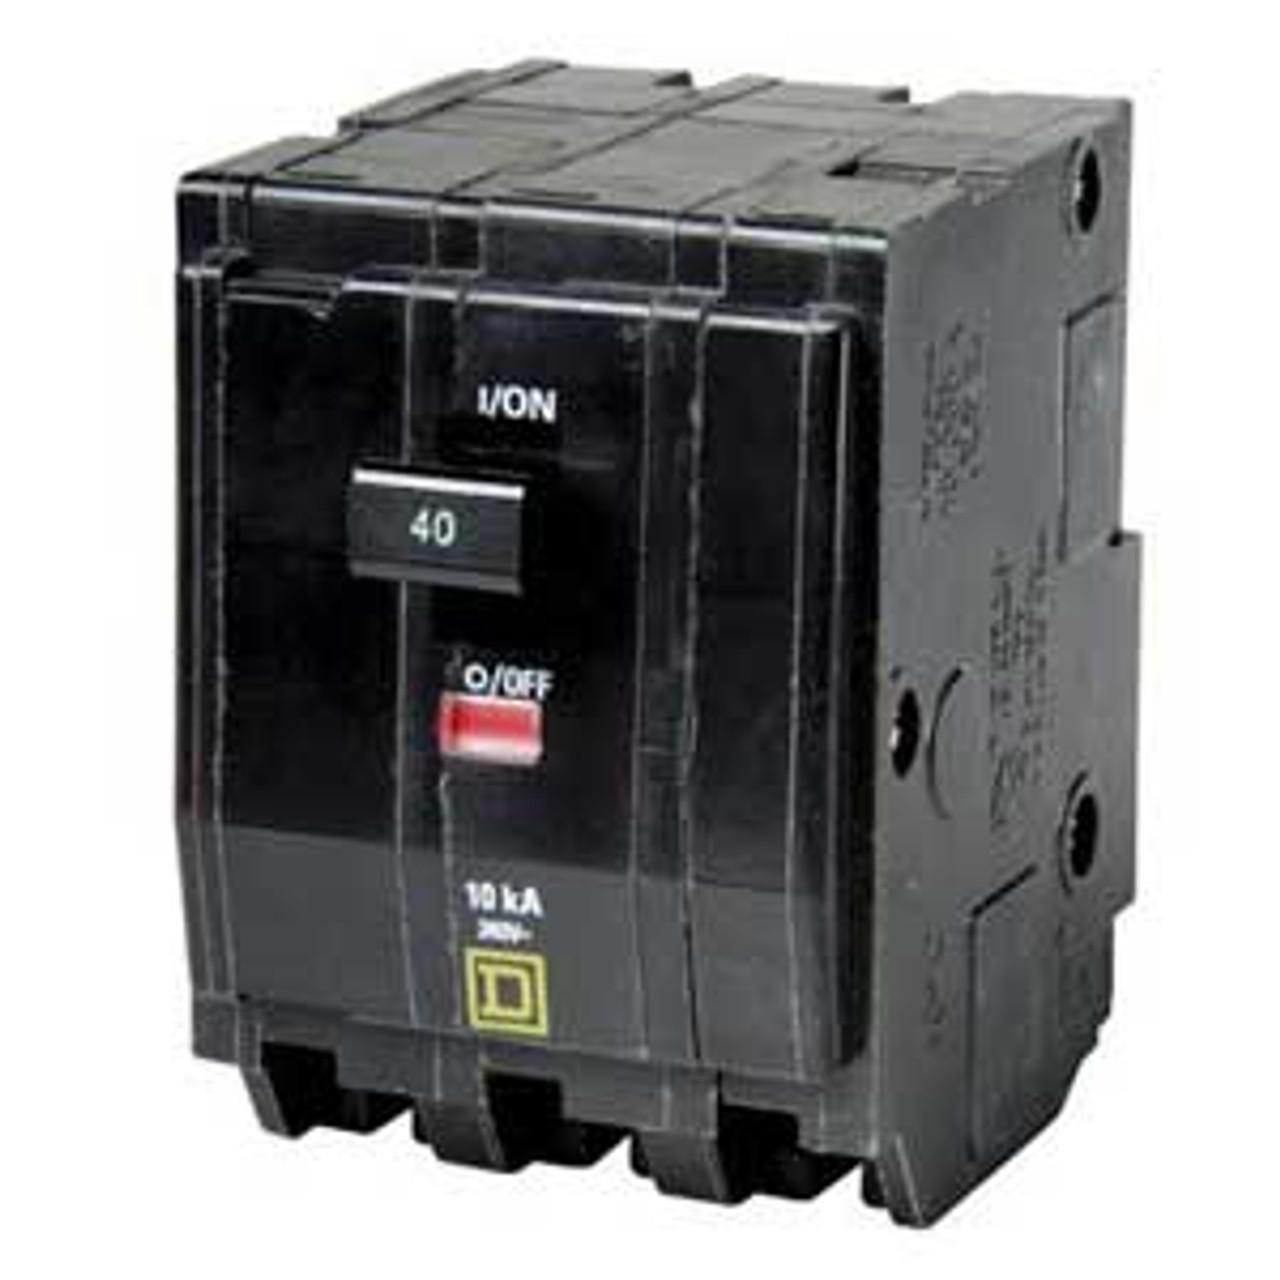 Square D QO360VH 3 Pole 60 Amp 240VAC 22K Circuit Breaker - New Pullout